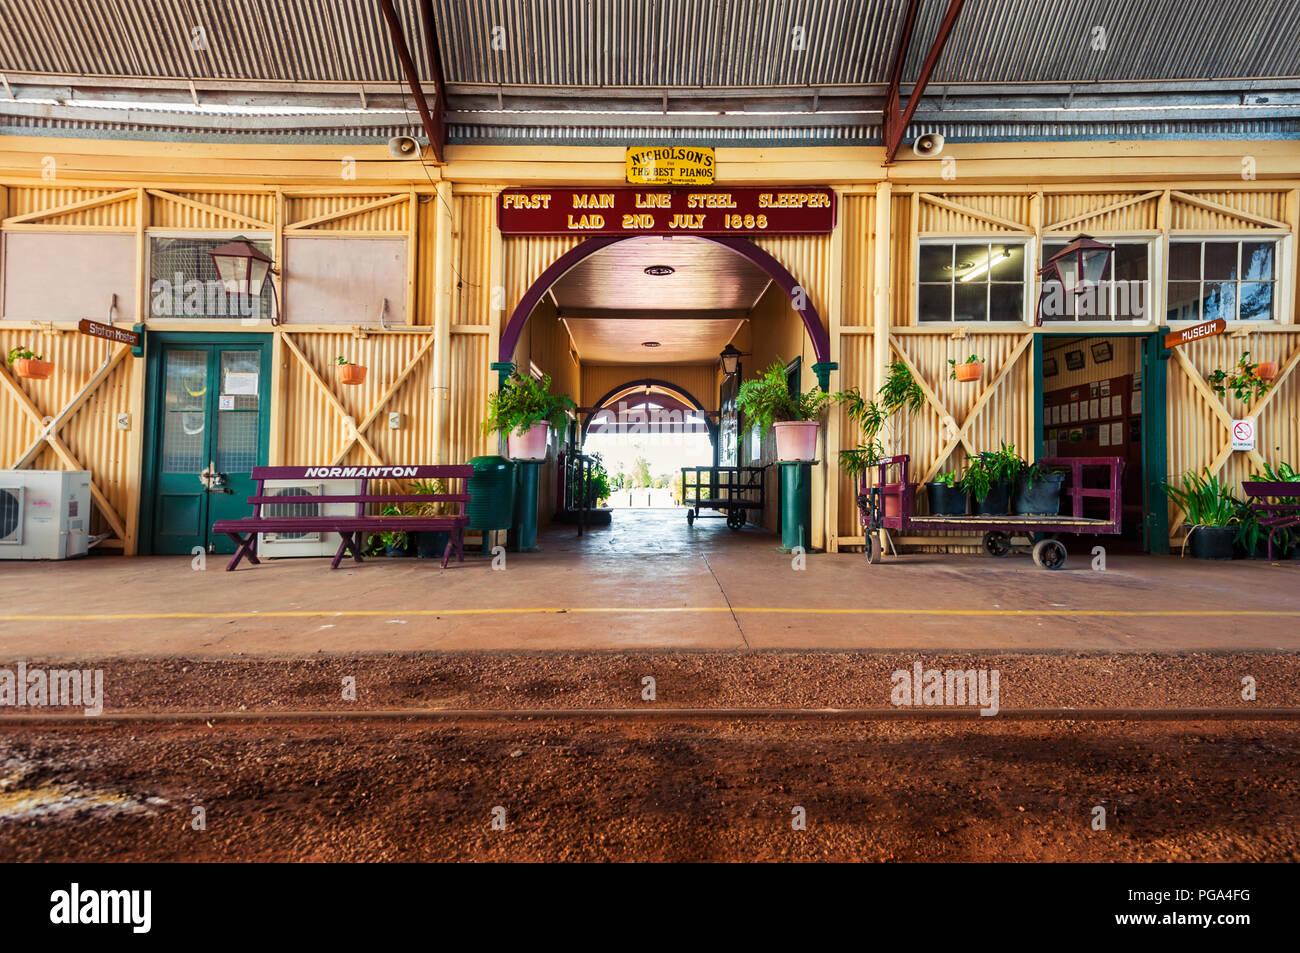 Normanton Railway Station at the remote Savannah Way. - Stock Image